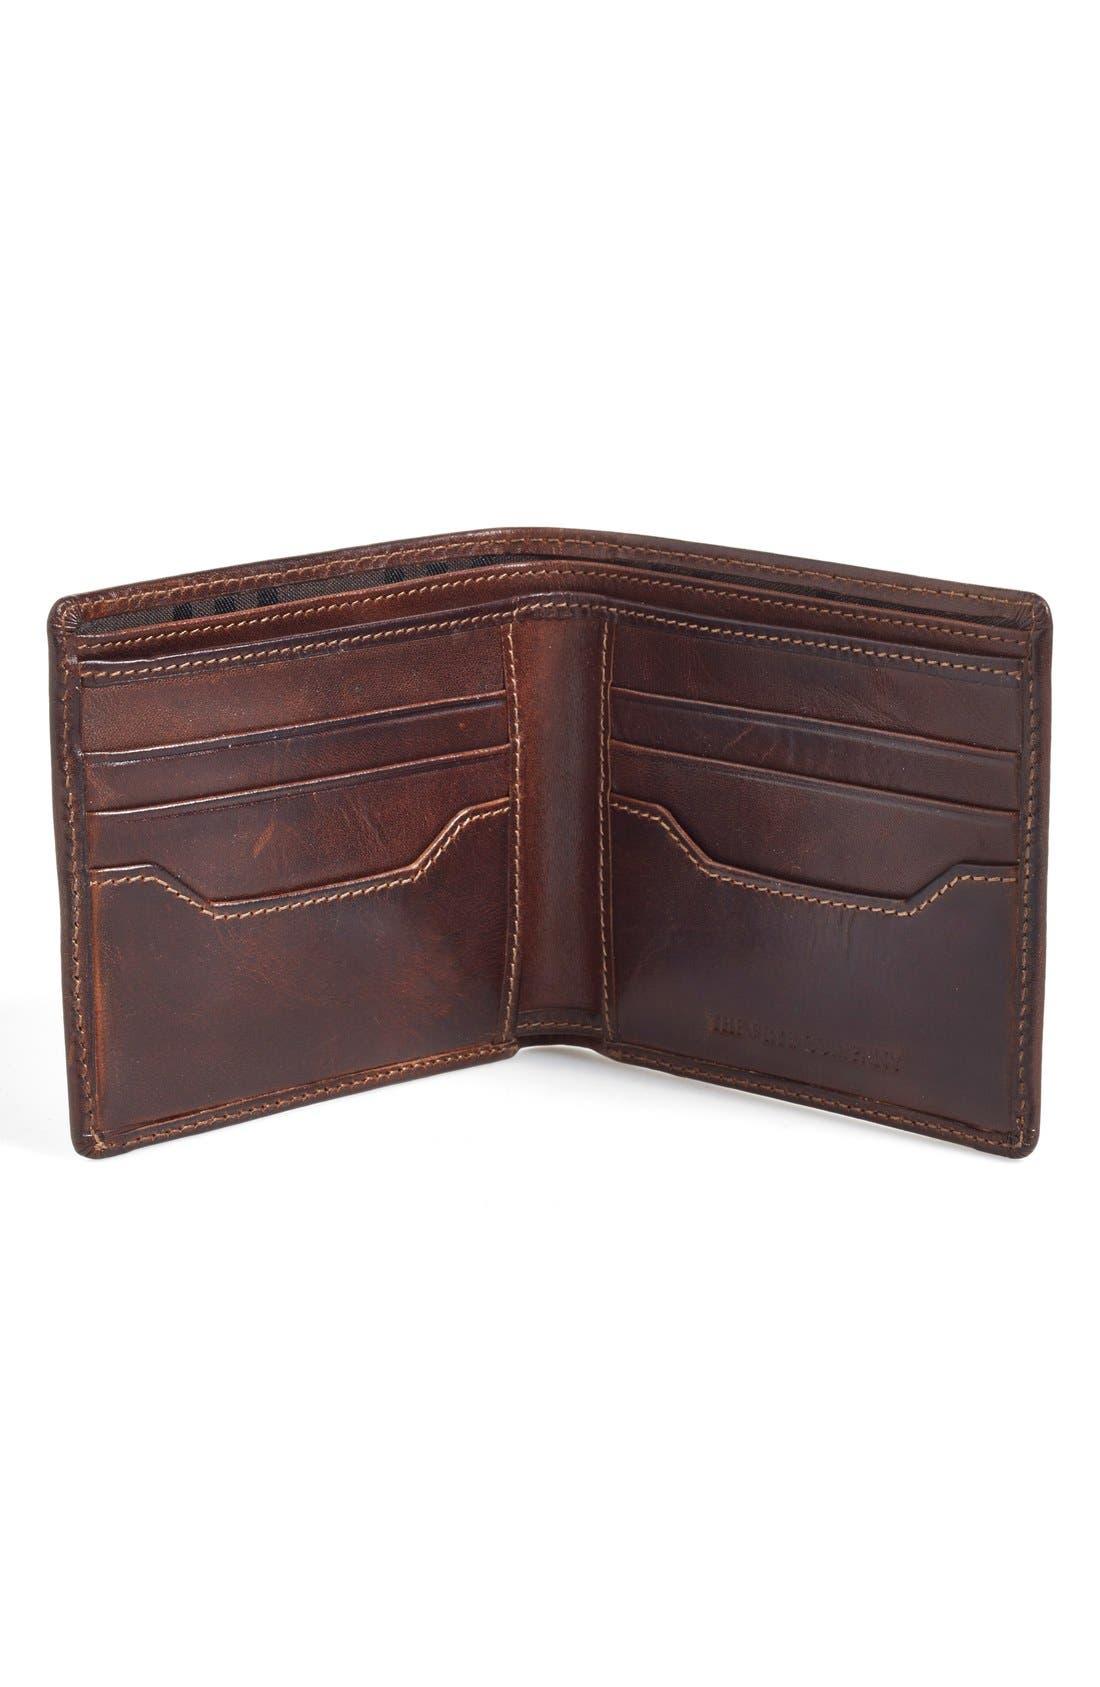 'Logan' Leather Billfold Wallet,                             Alternate thumbnail 2, color,                             DARK BROWN